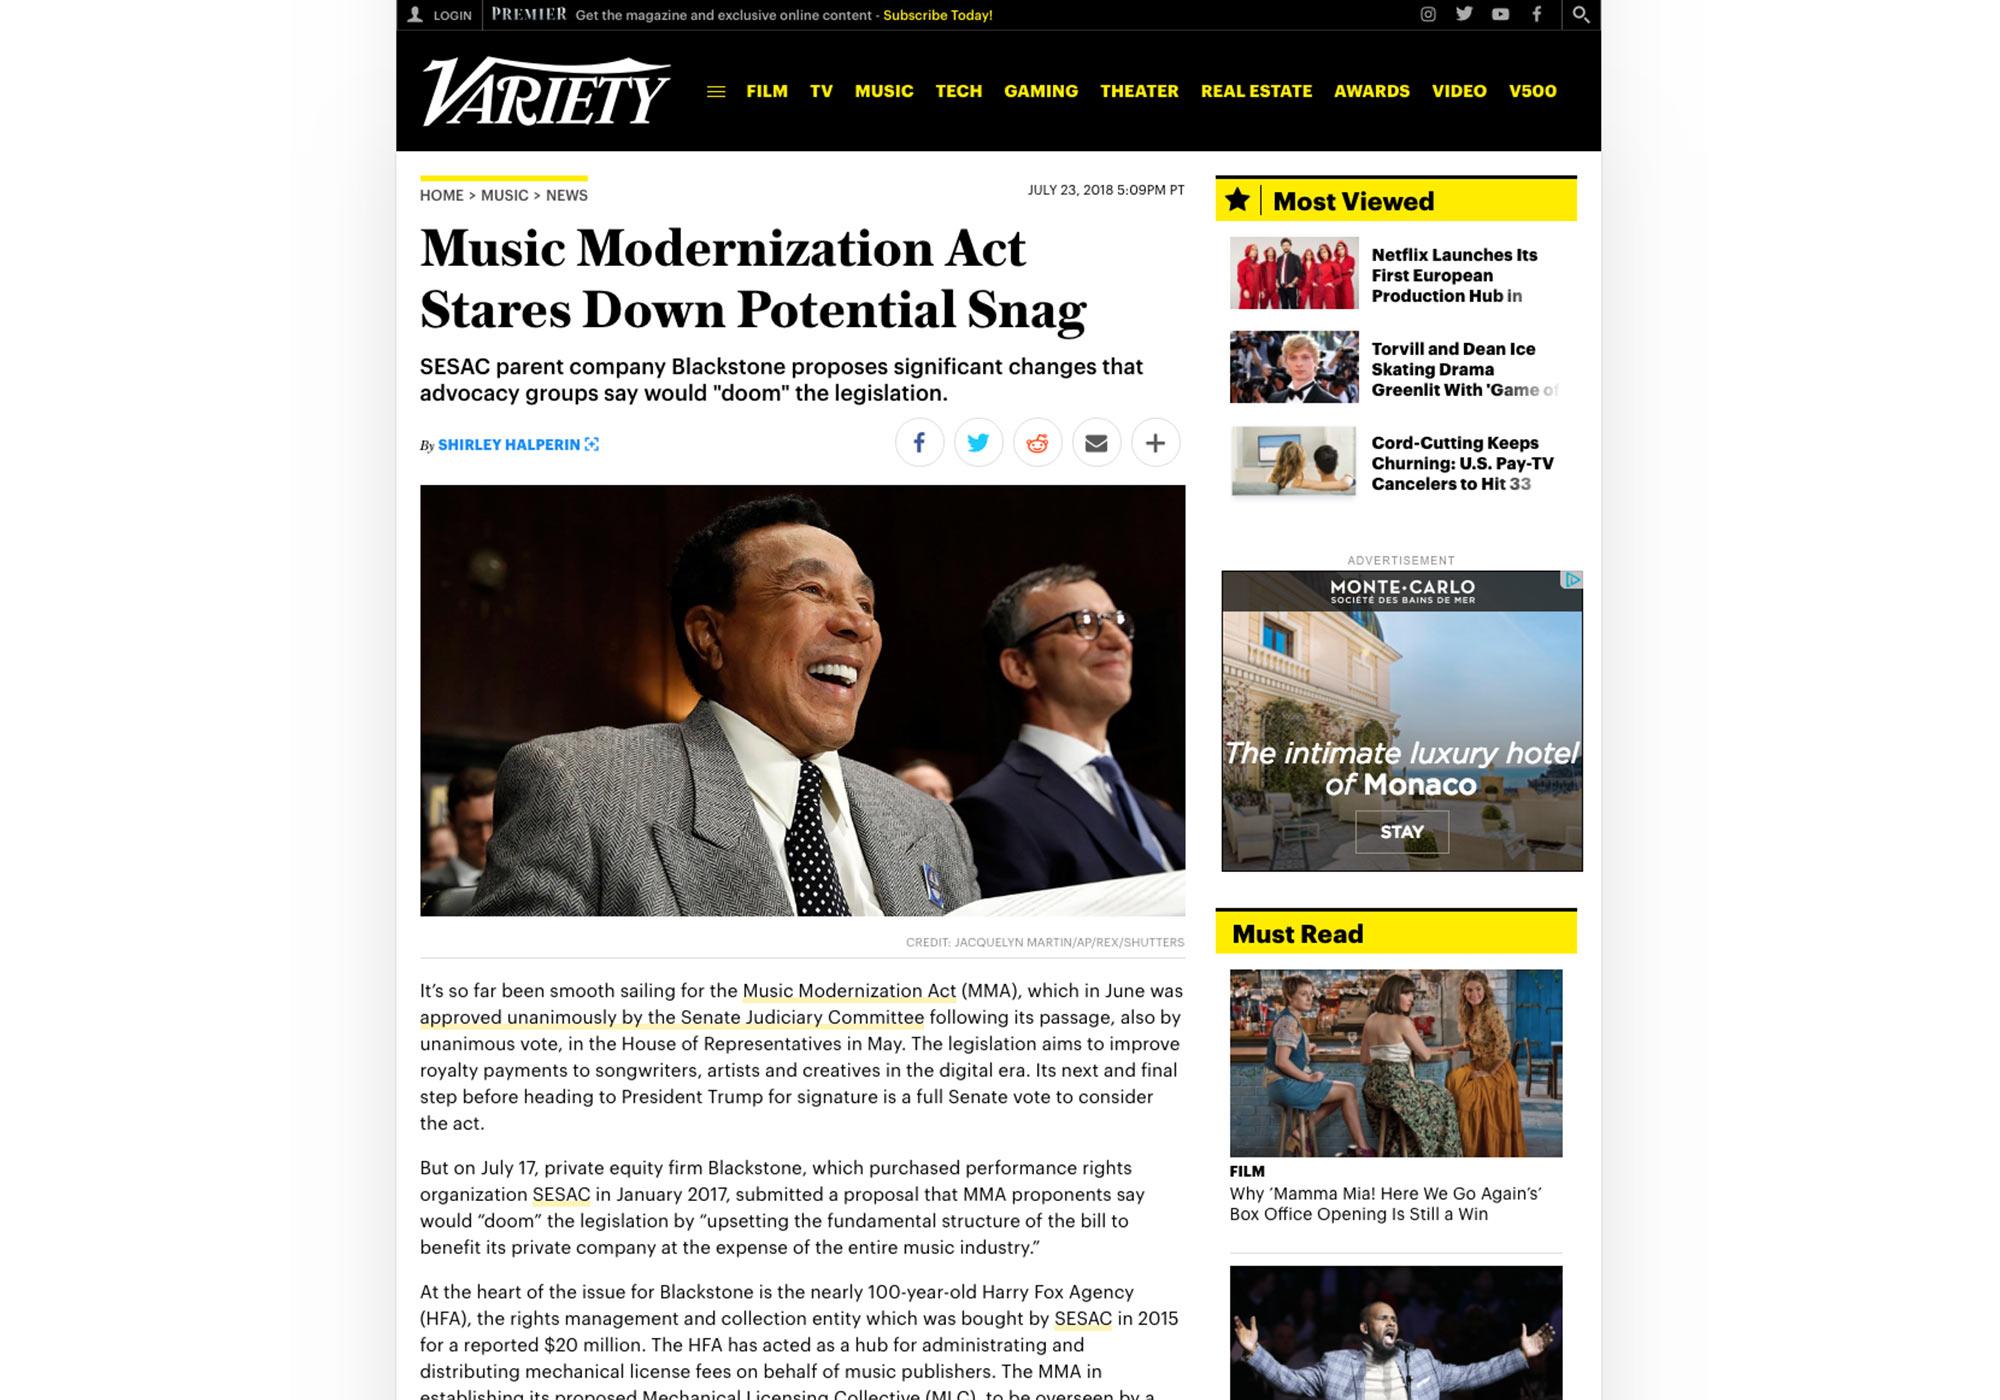 Fairness Rocks News Music Modernization Act Stares Down Potential Snag